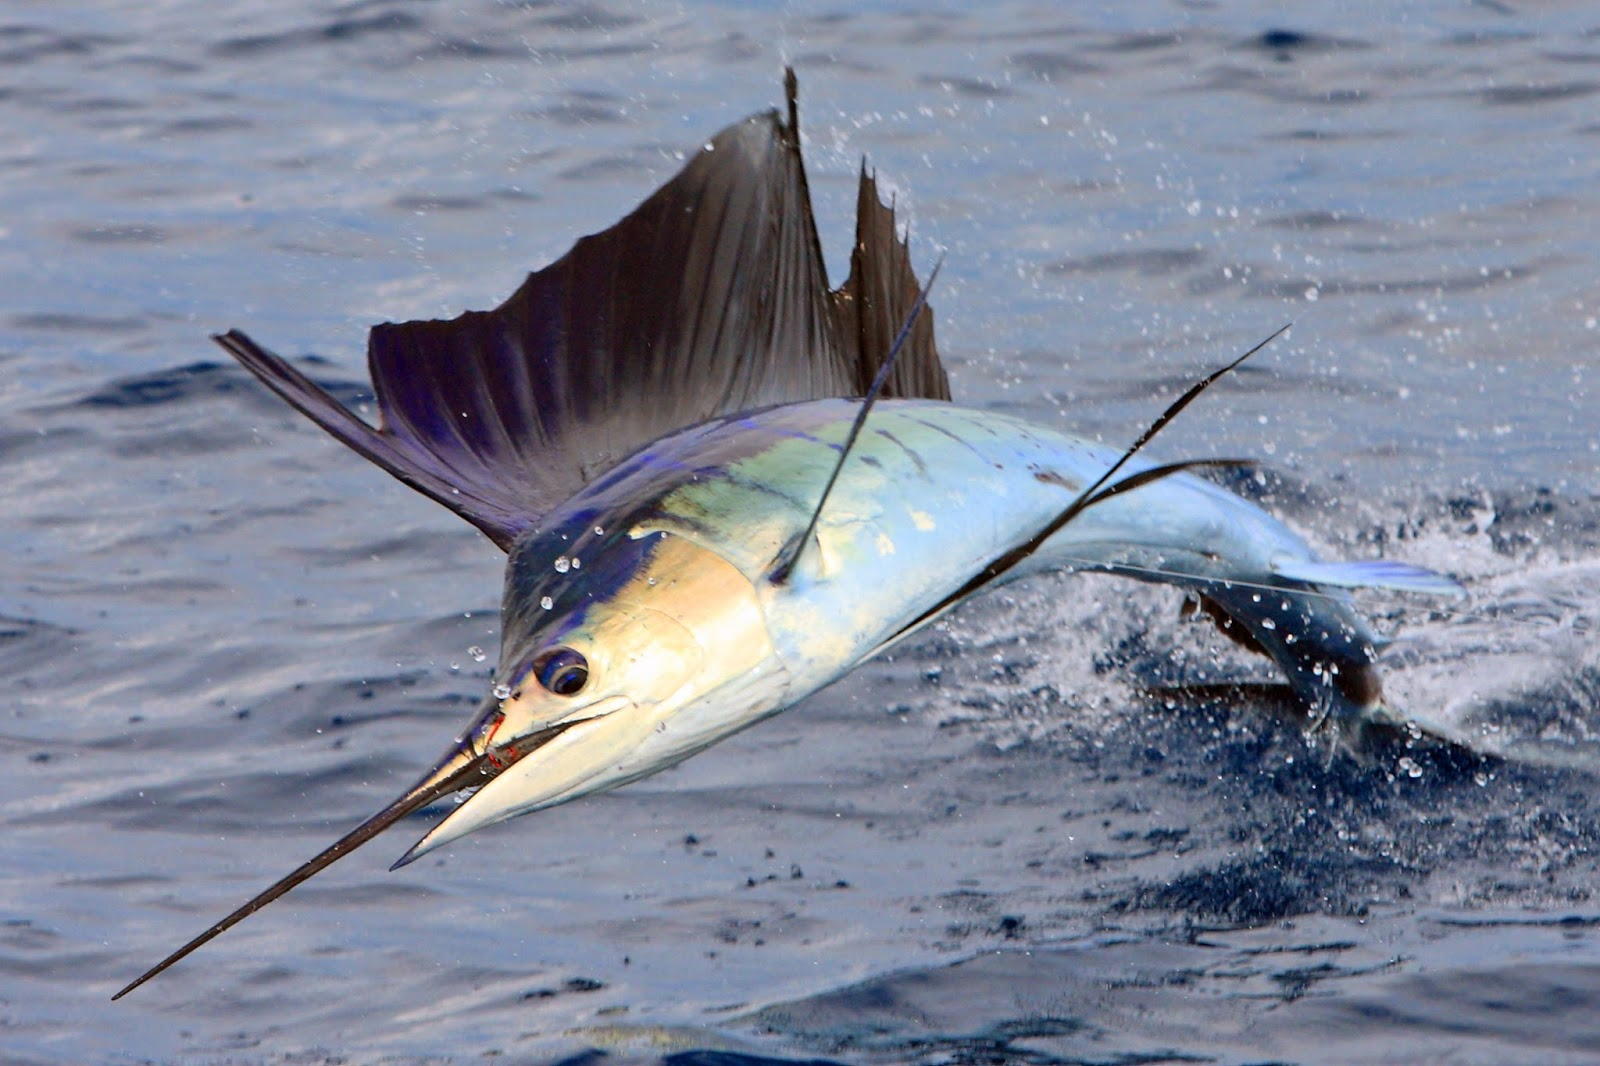 Sailfish vs marlin - photo#5